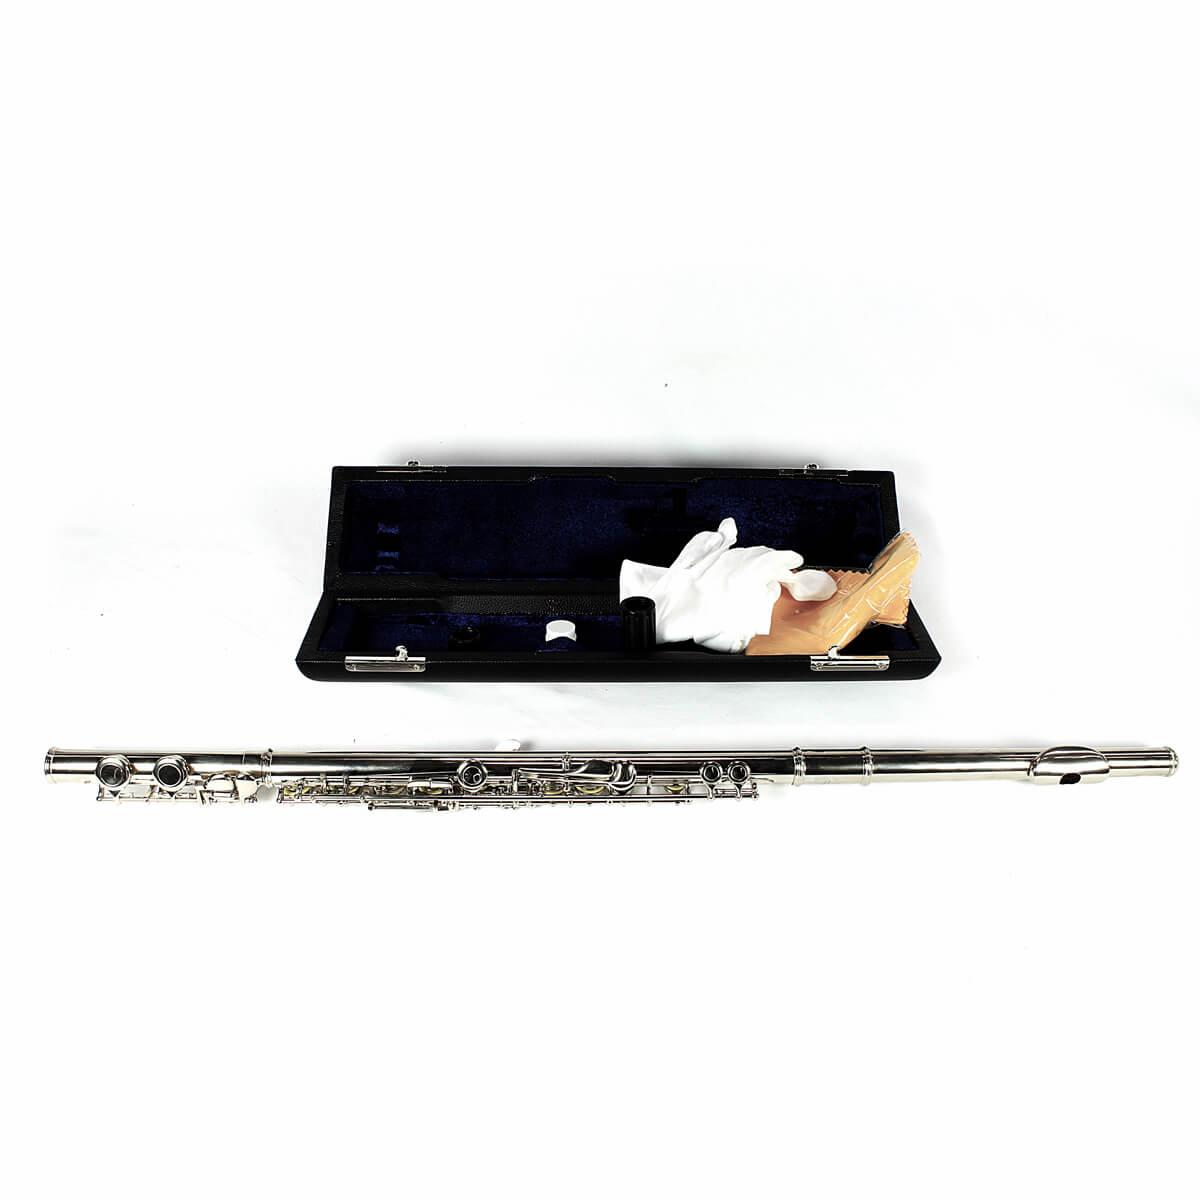 Flauta Transversal - Jahnke - Niquelada